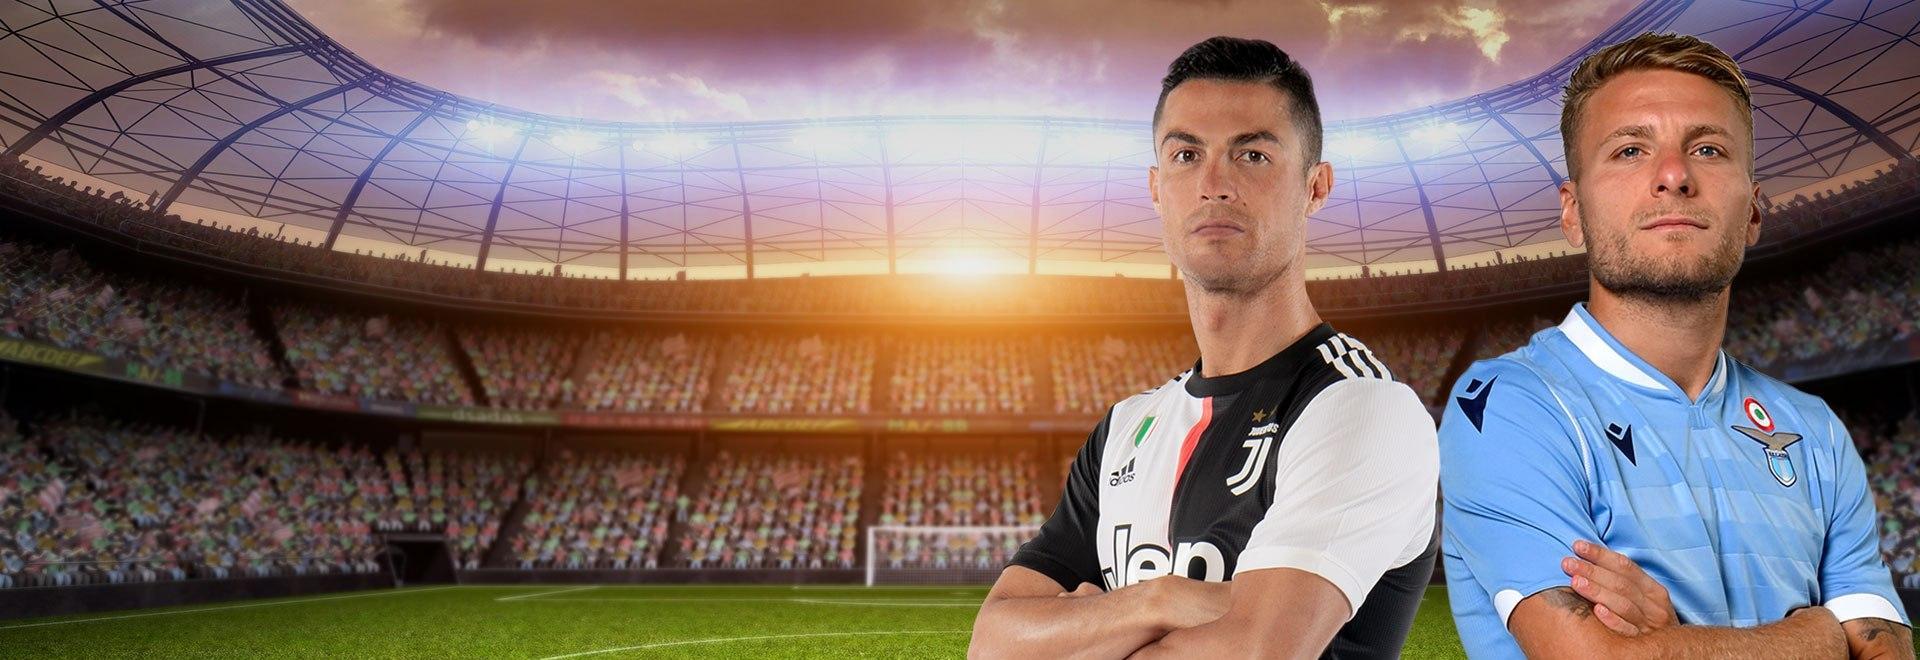 Juventus - Lazio. 34a g.